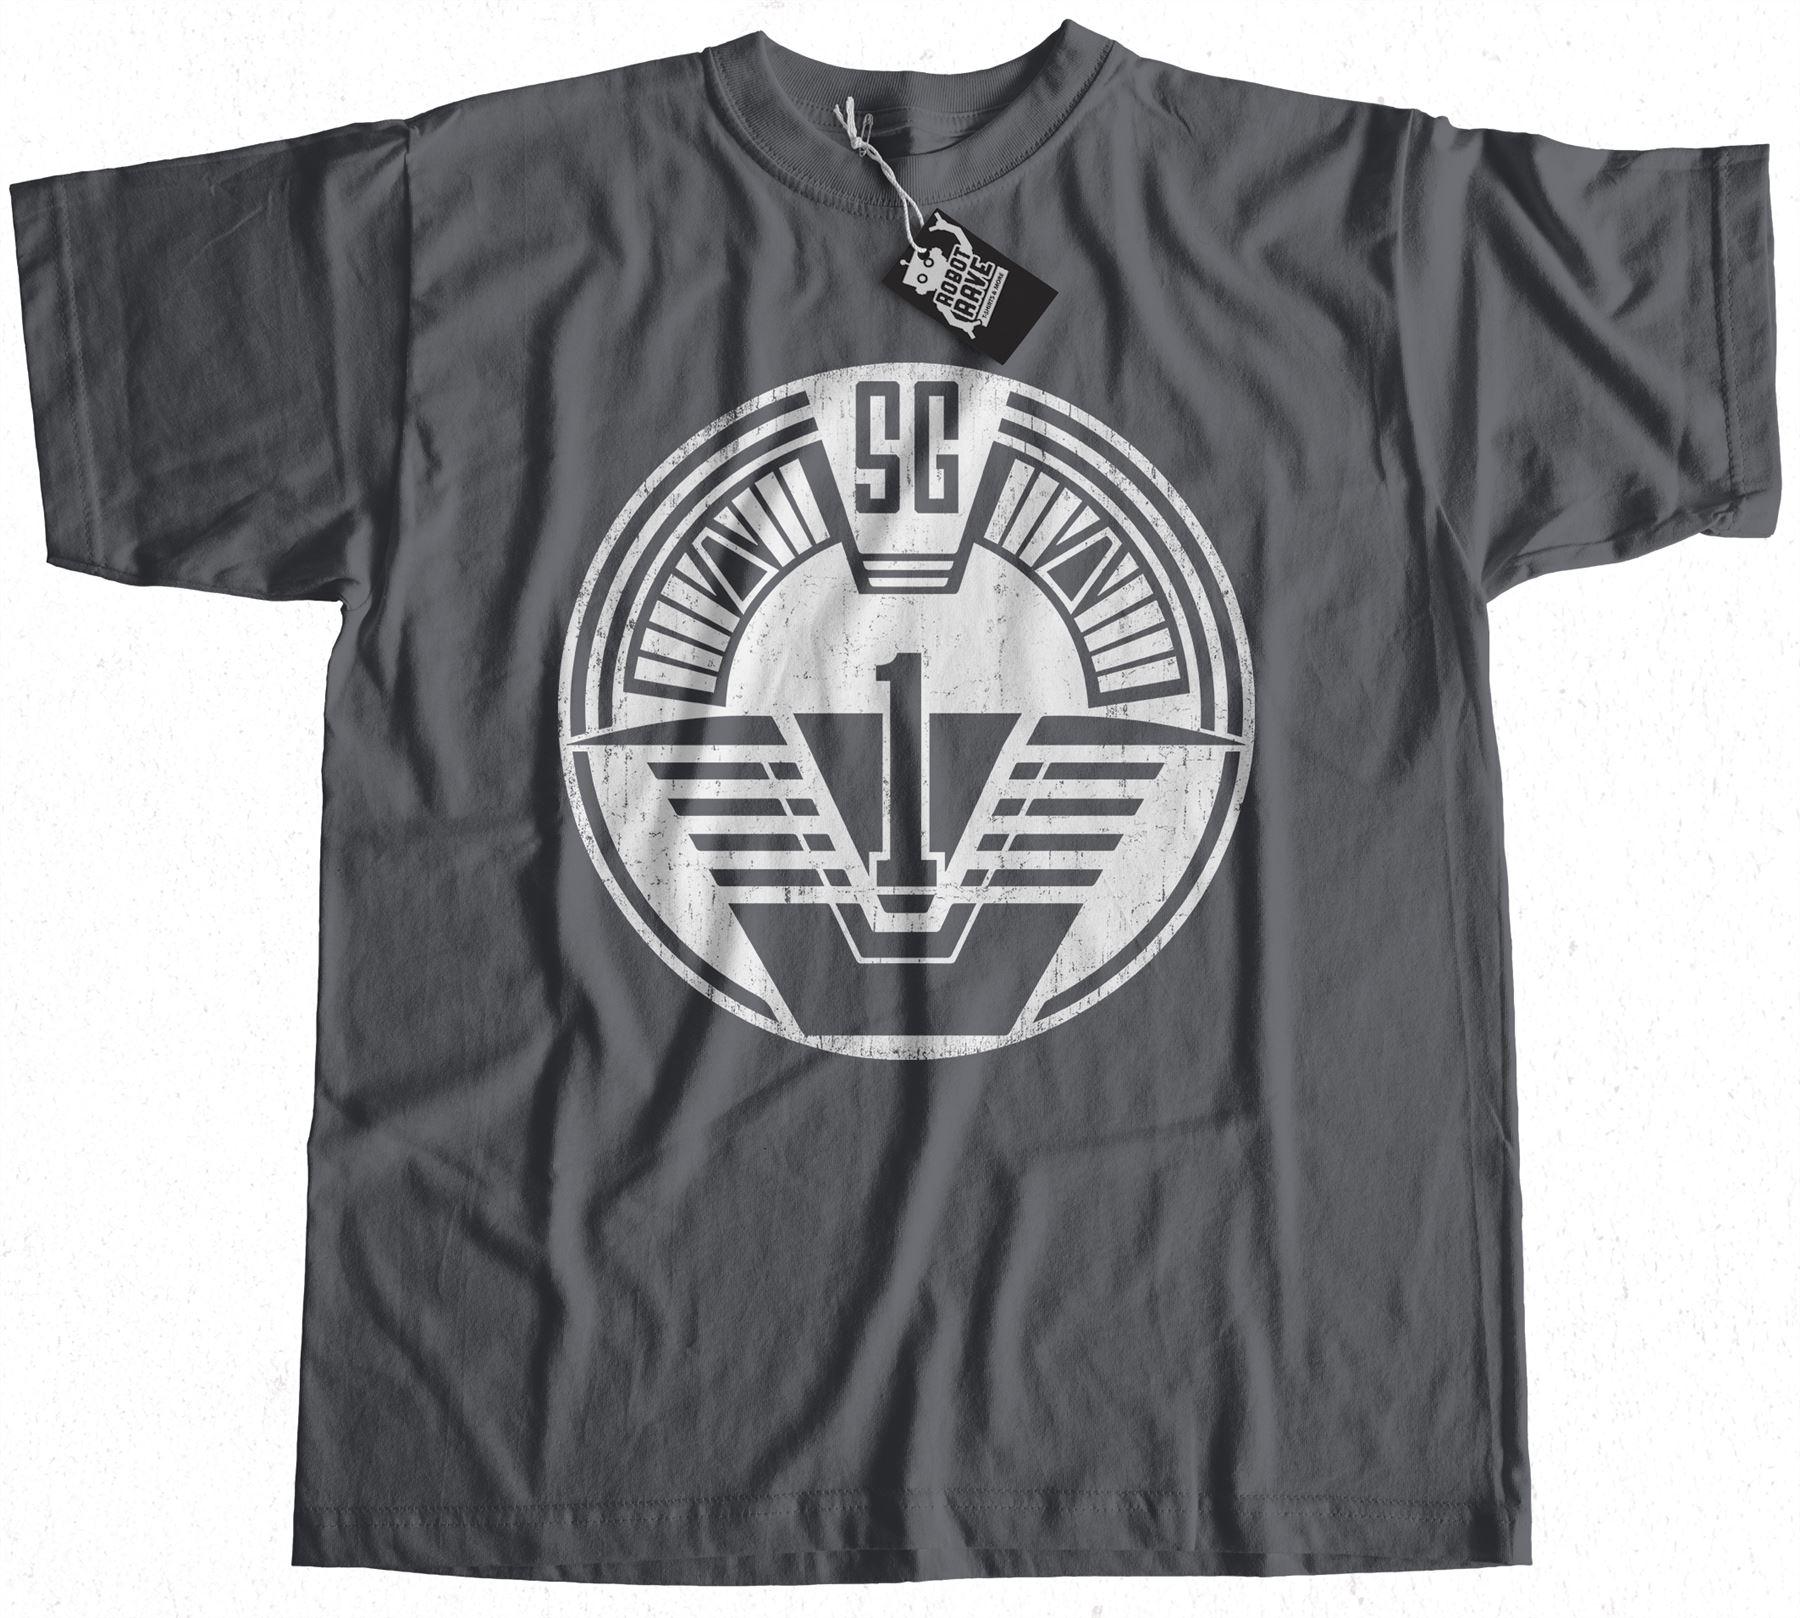 SG1-T-Shirt-100-Premium-Cotton Indexbild 12